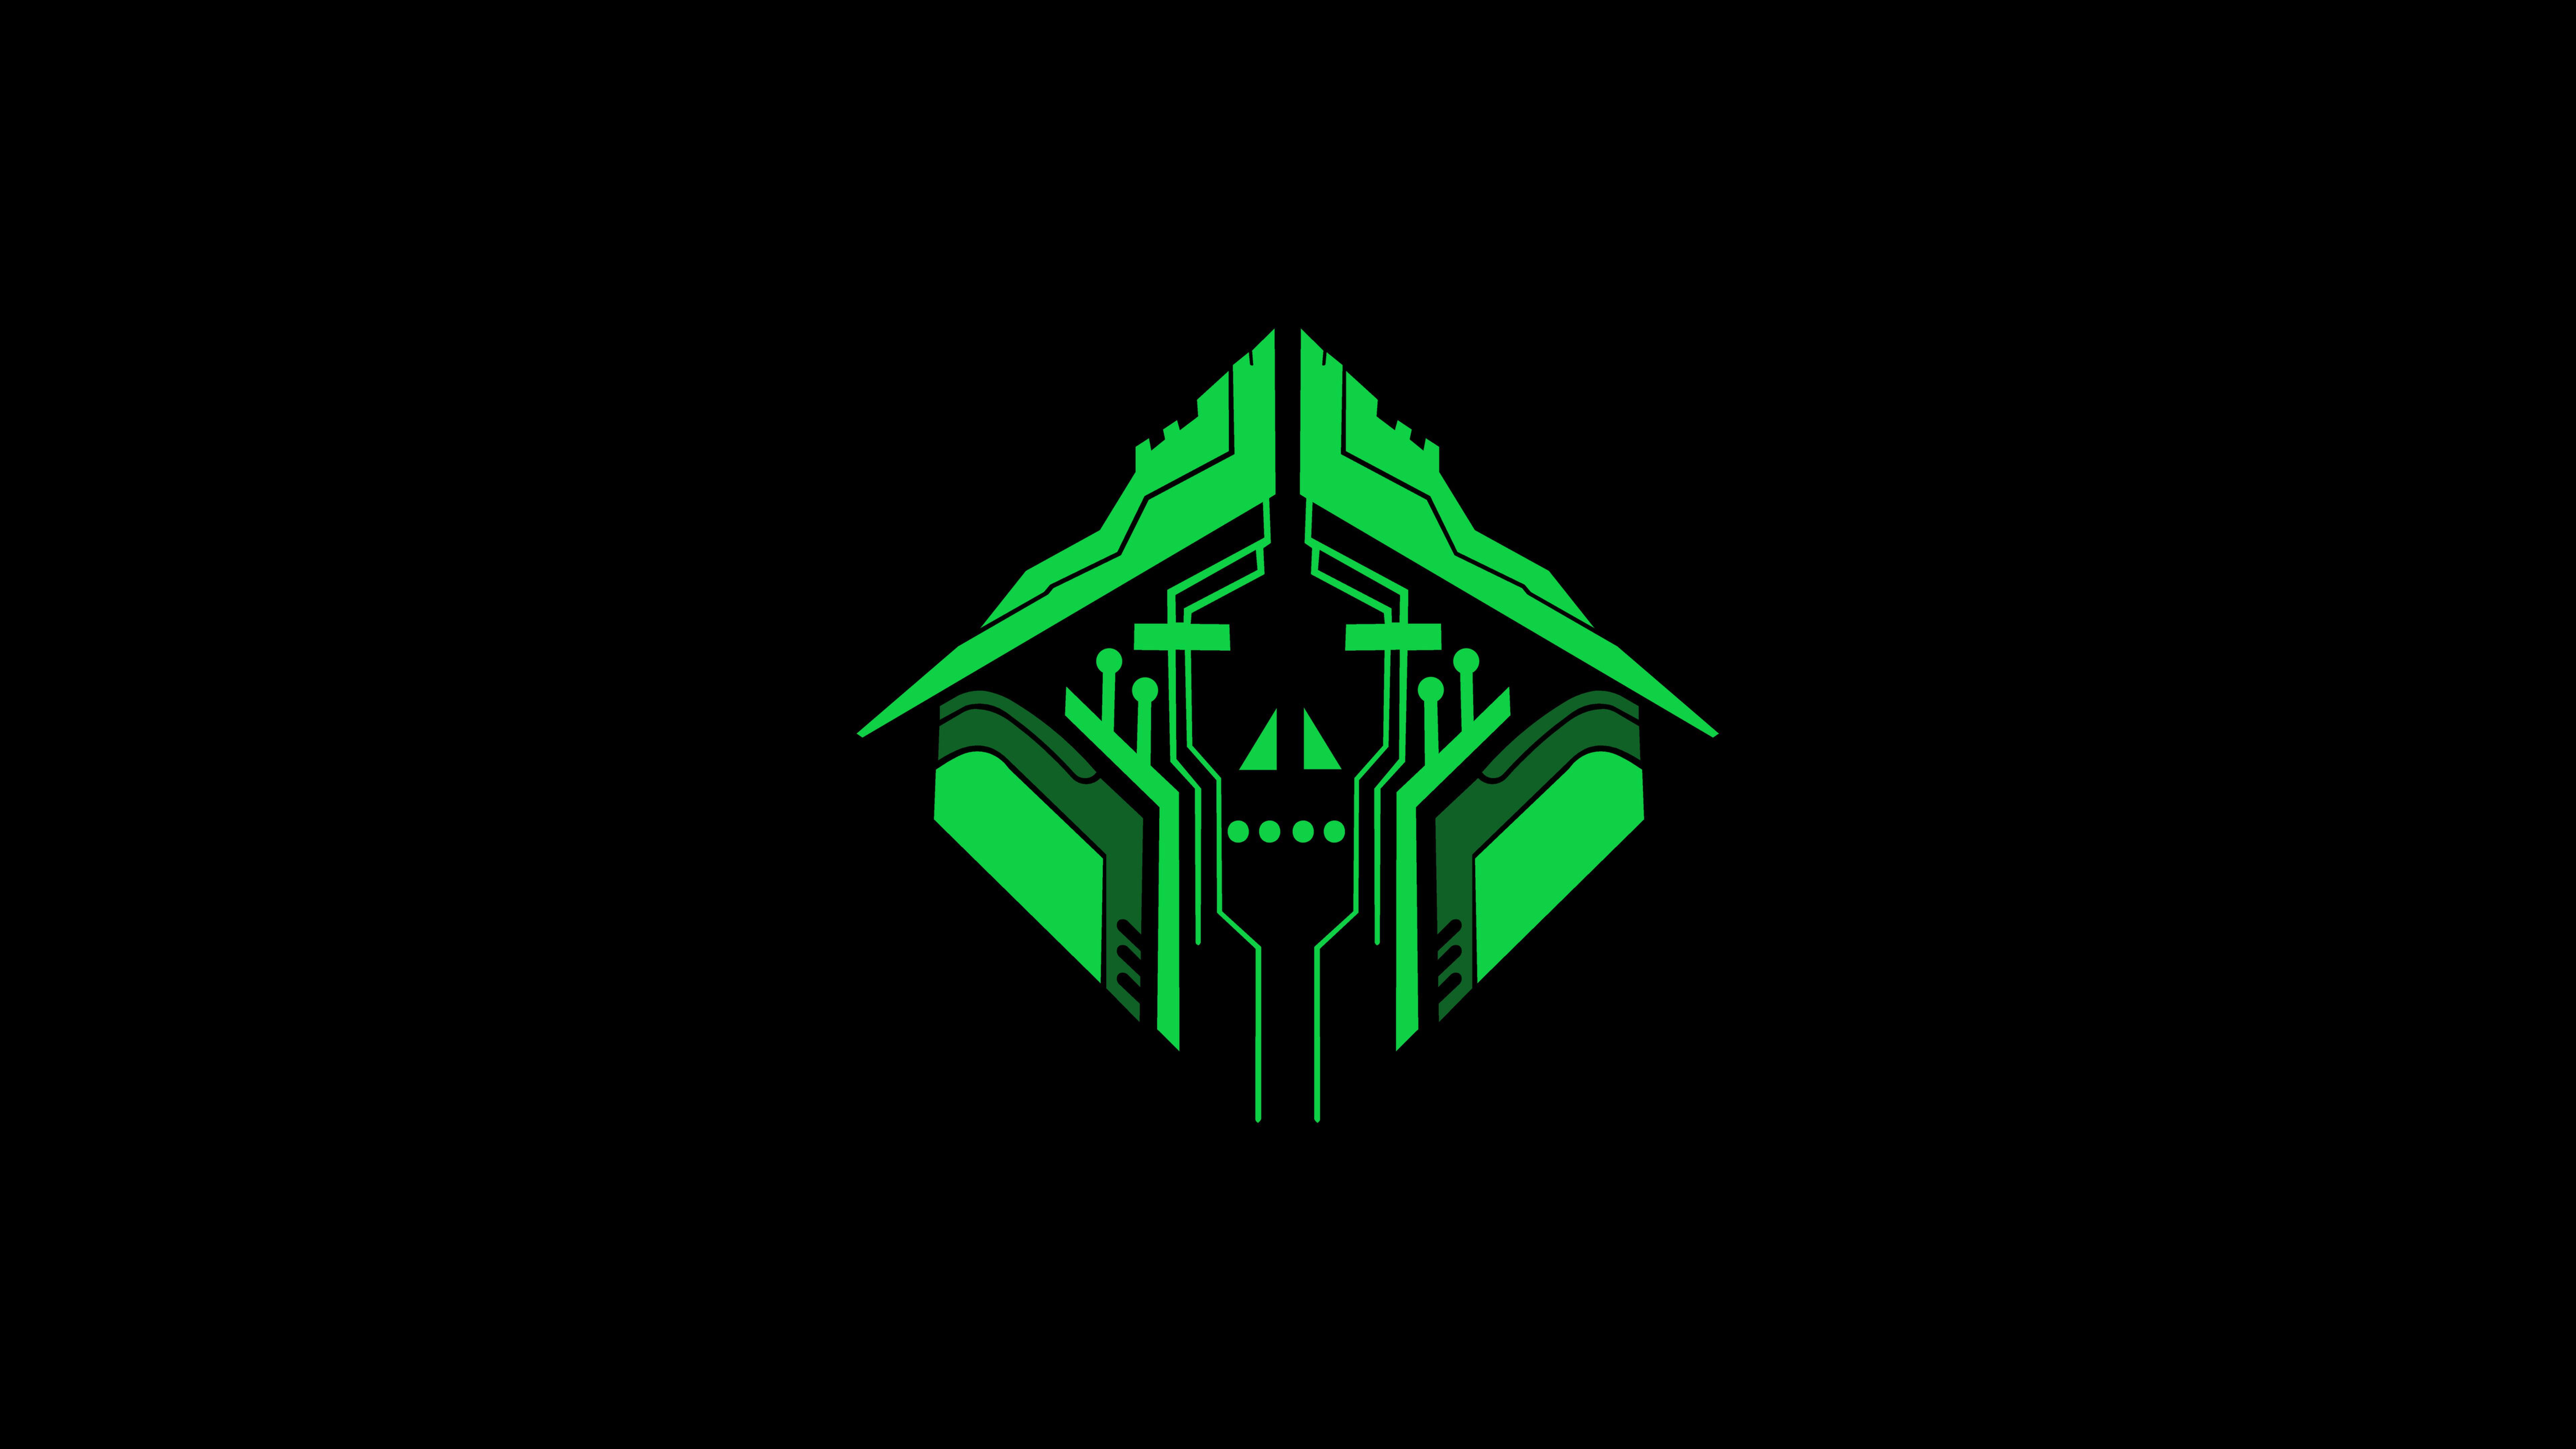 7680x4320 Crypto Apex Legends 4K Logo 8K Wallpaper, HD ...